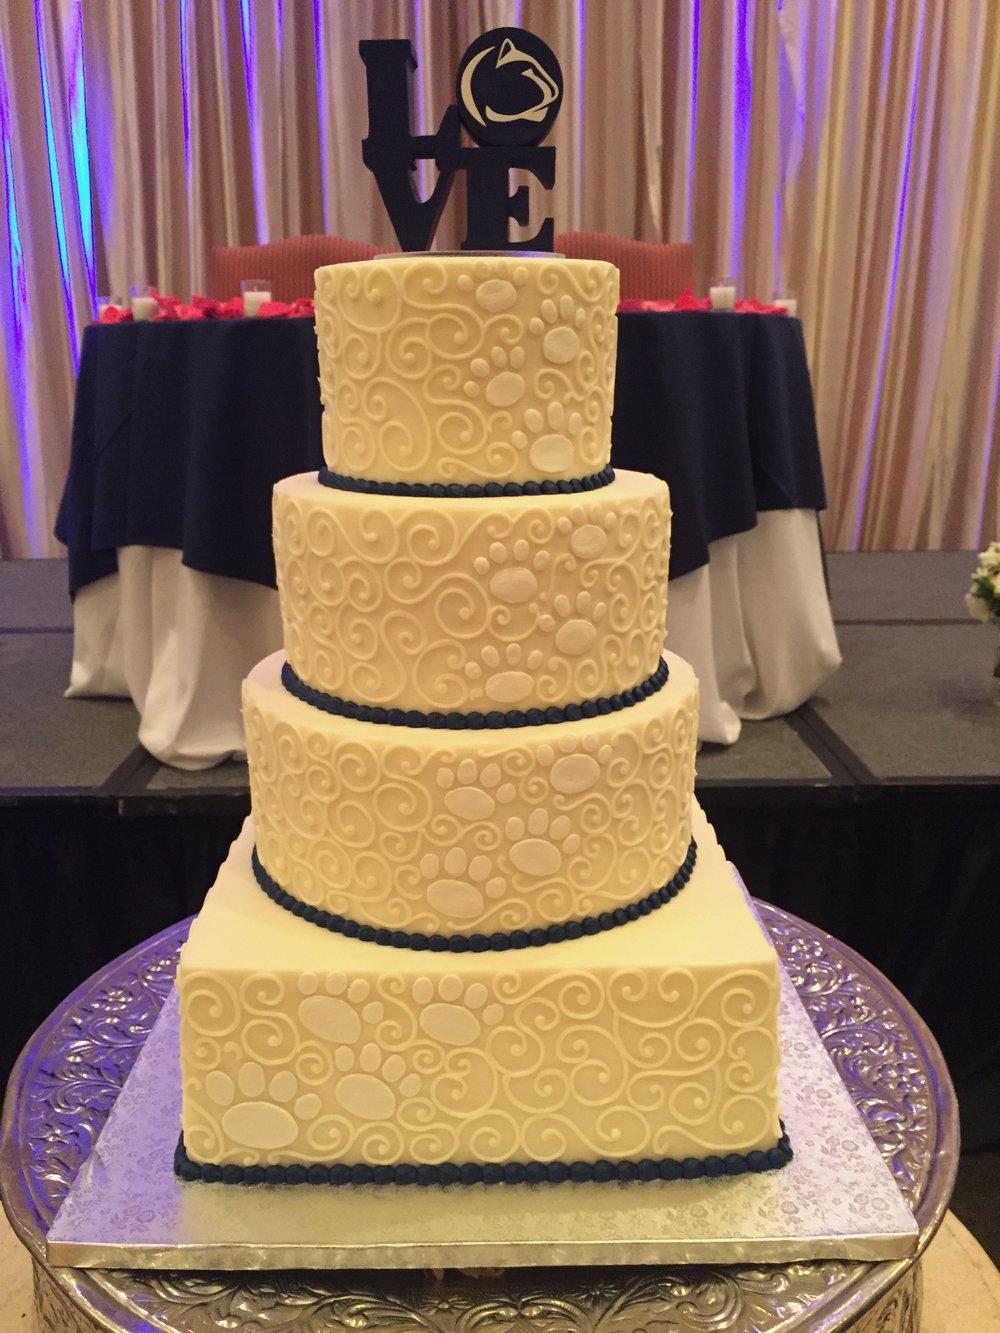 Penn State Bride and Groom Wedding Cake